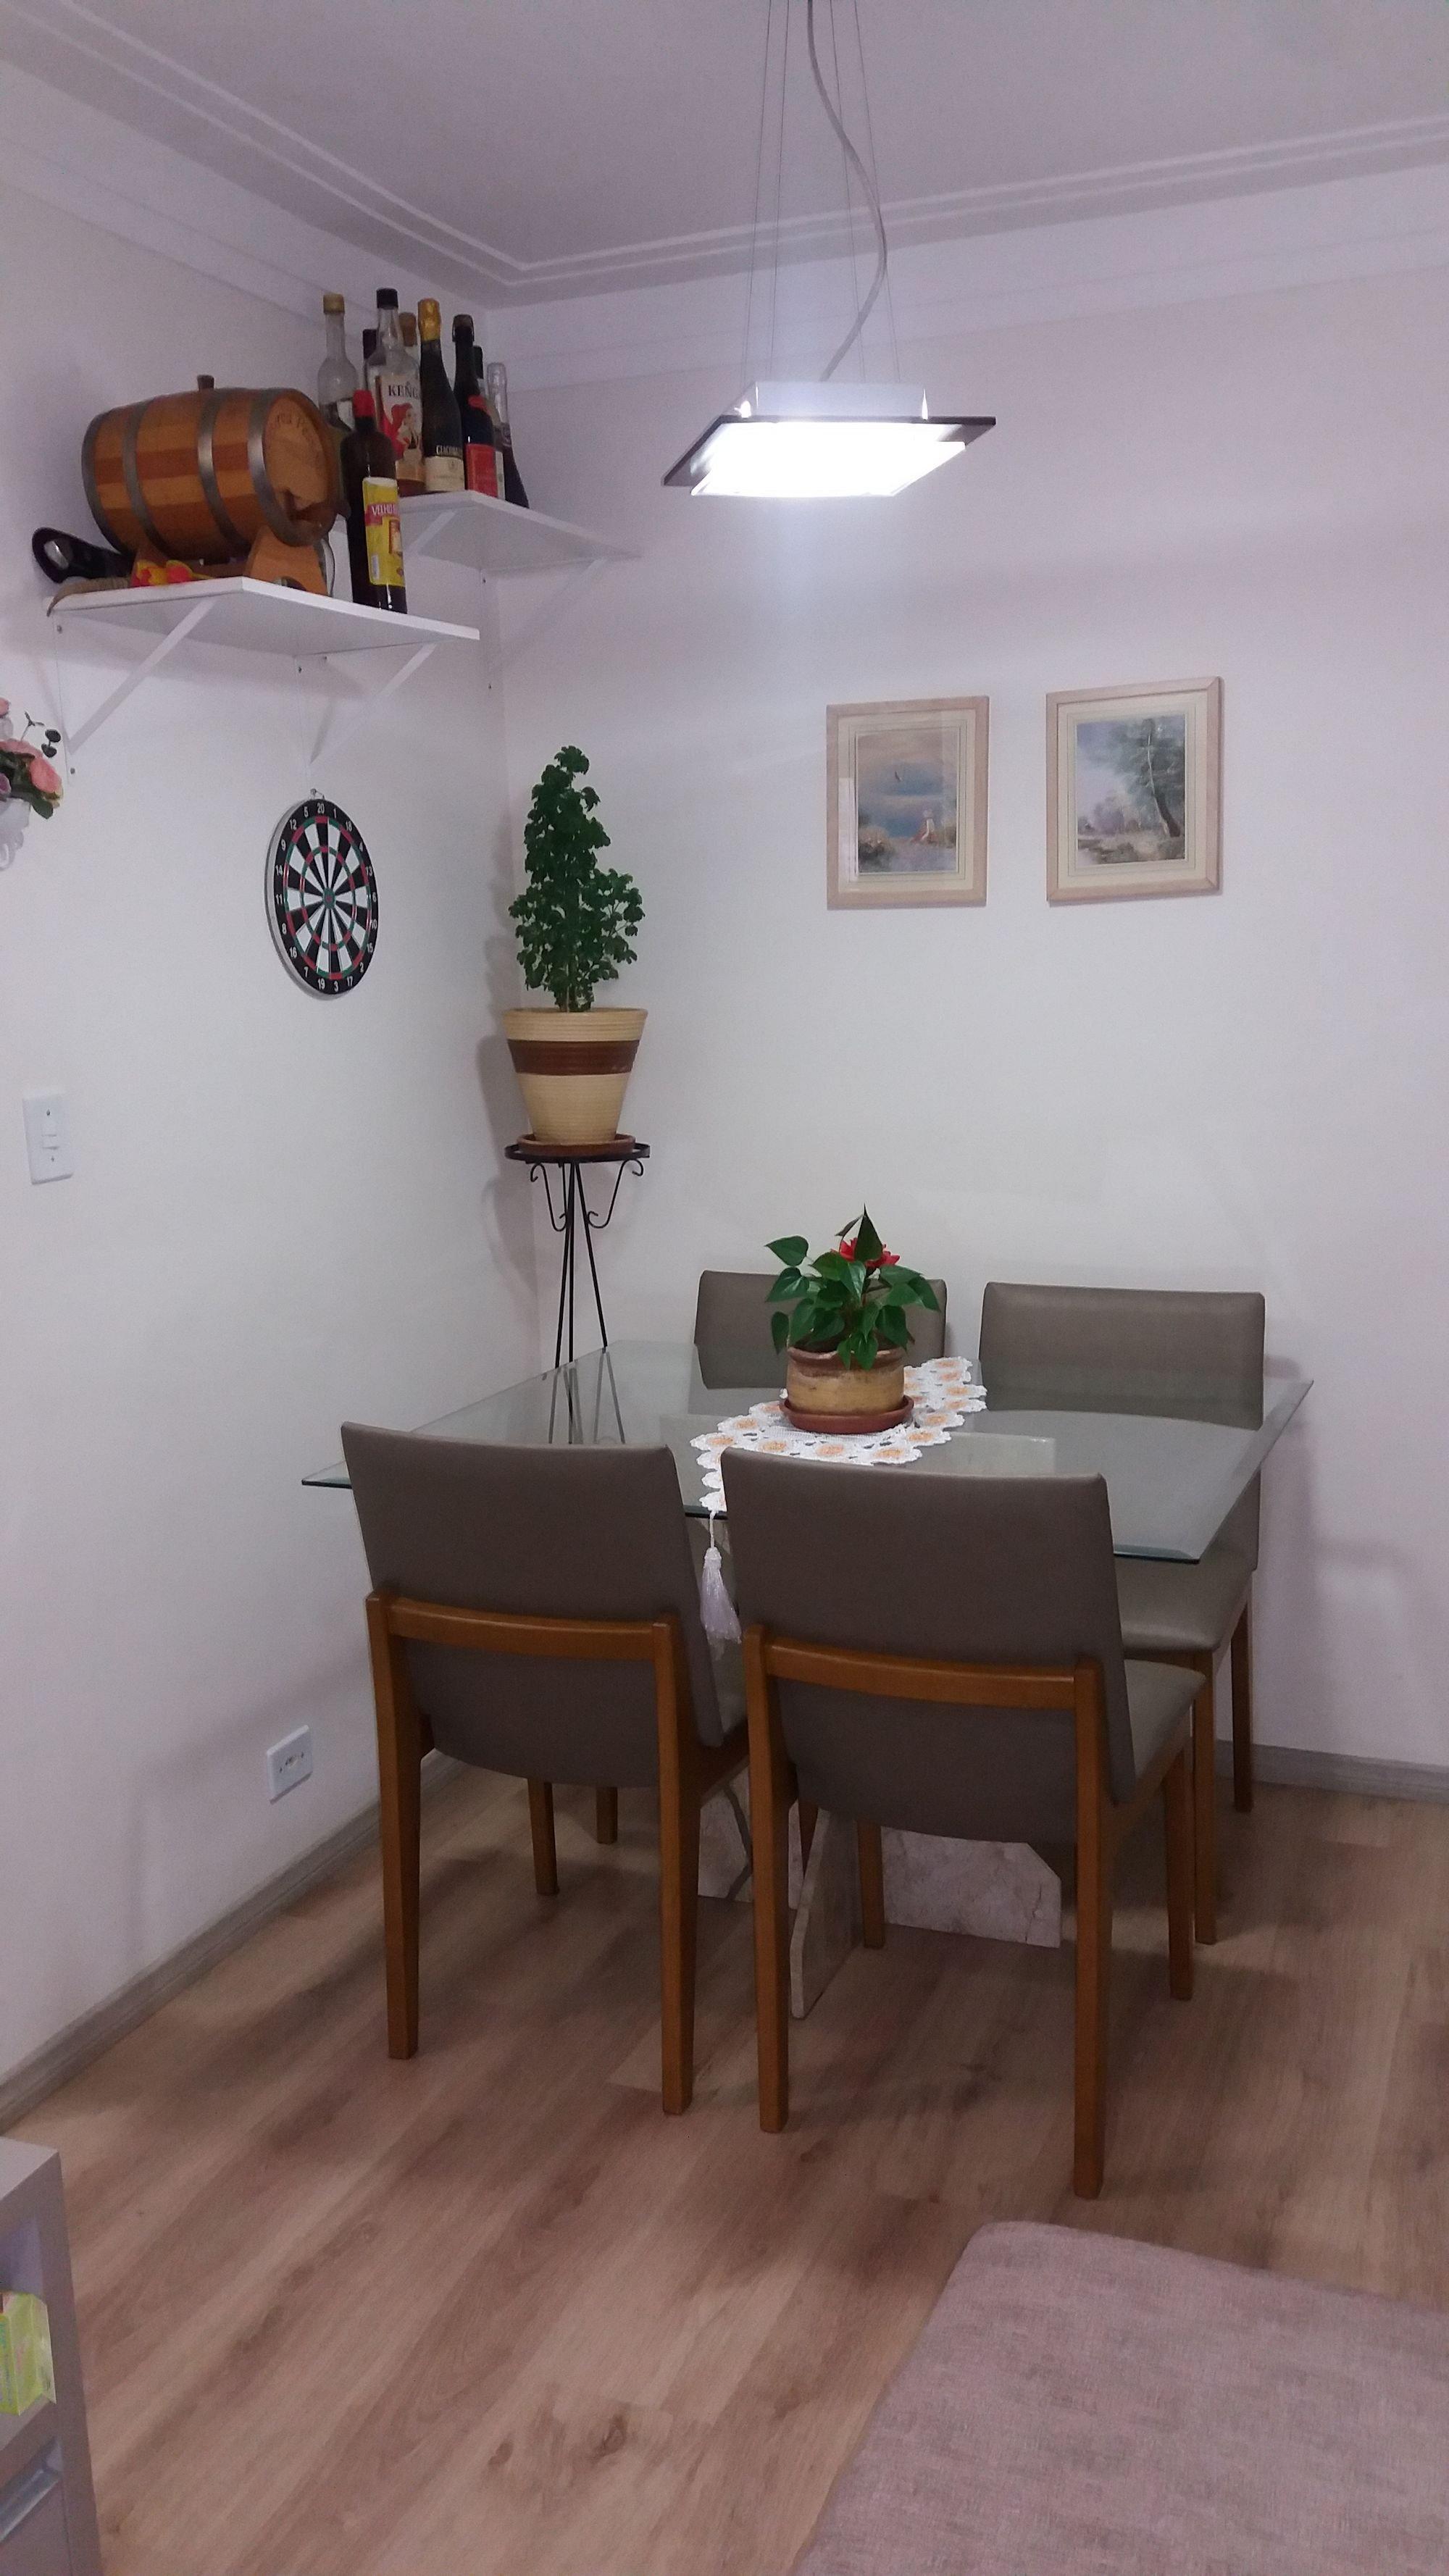 Foto de Sala com vaso de planta, cadeira, garrafa